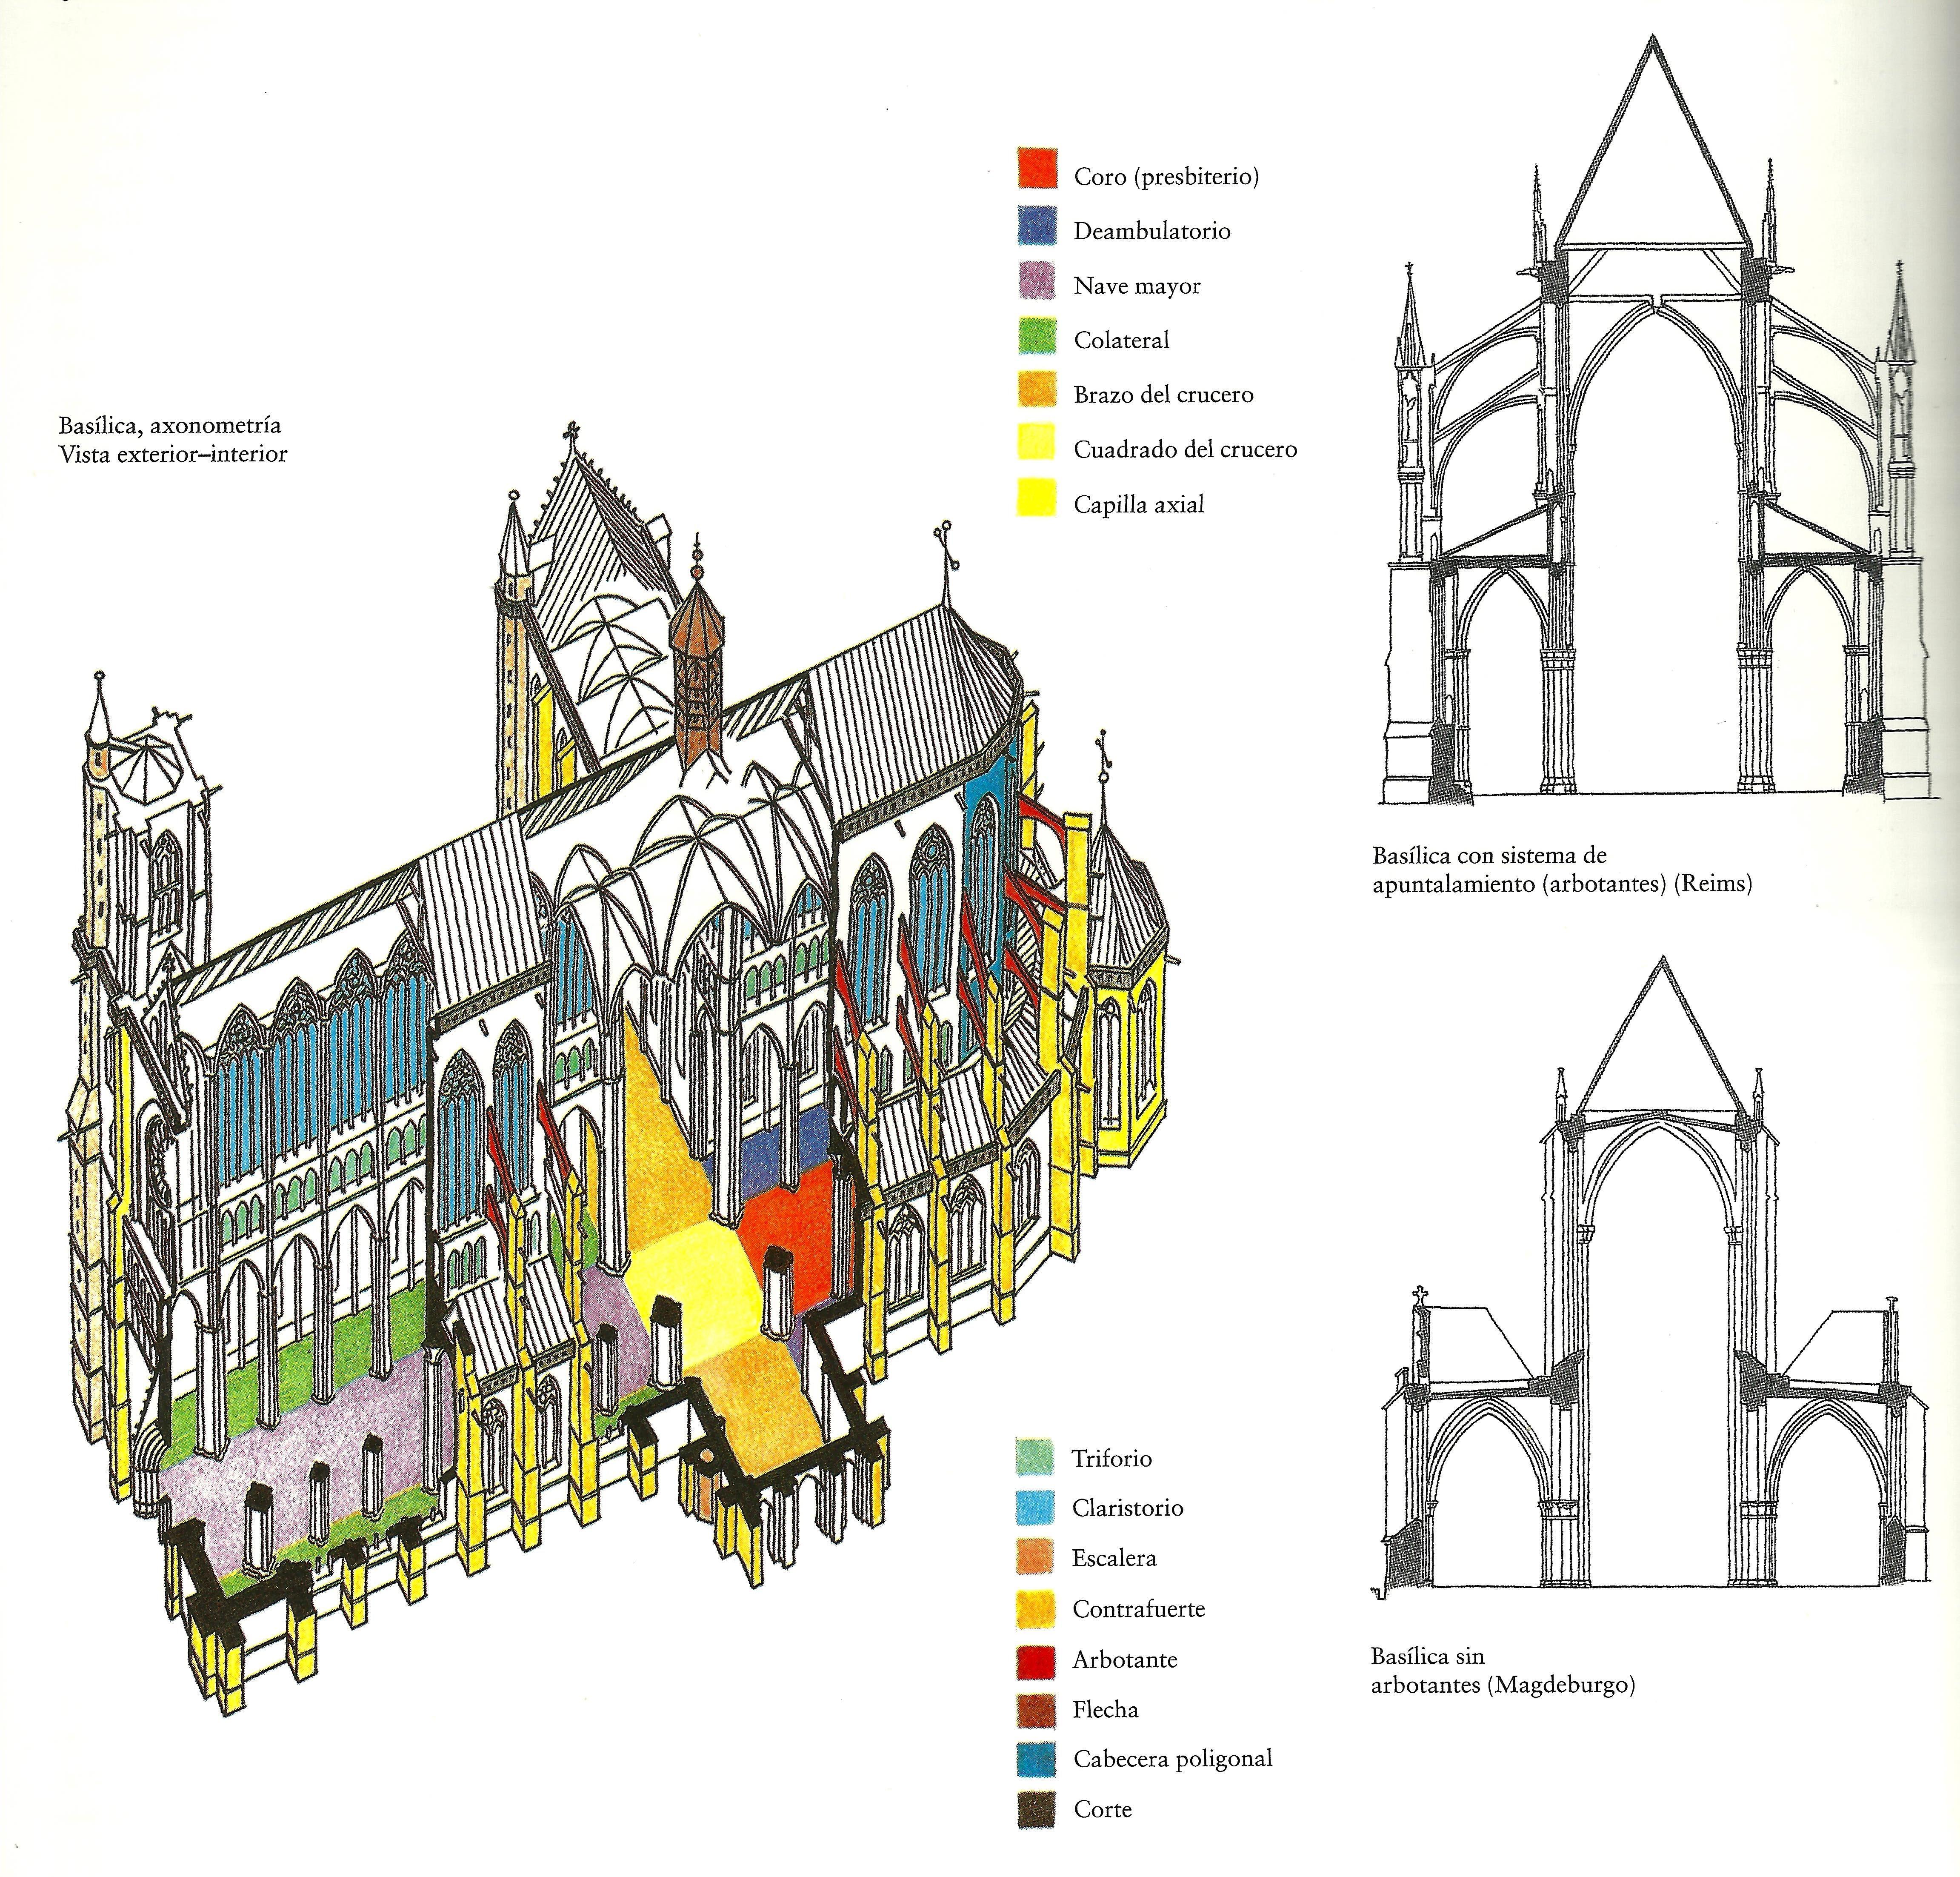 Esquema de catedral g tica introducci n al arte g tico - Alzado arquitectura ...